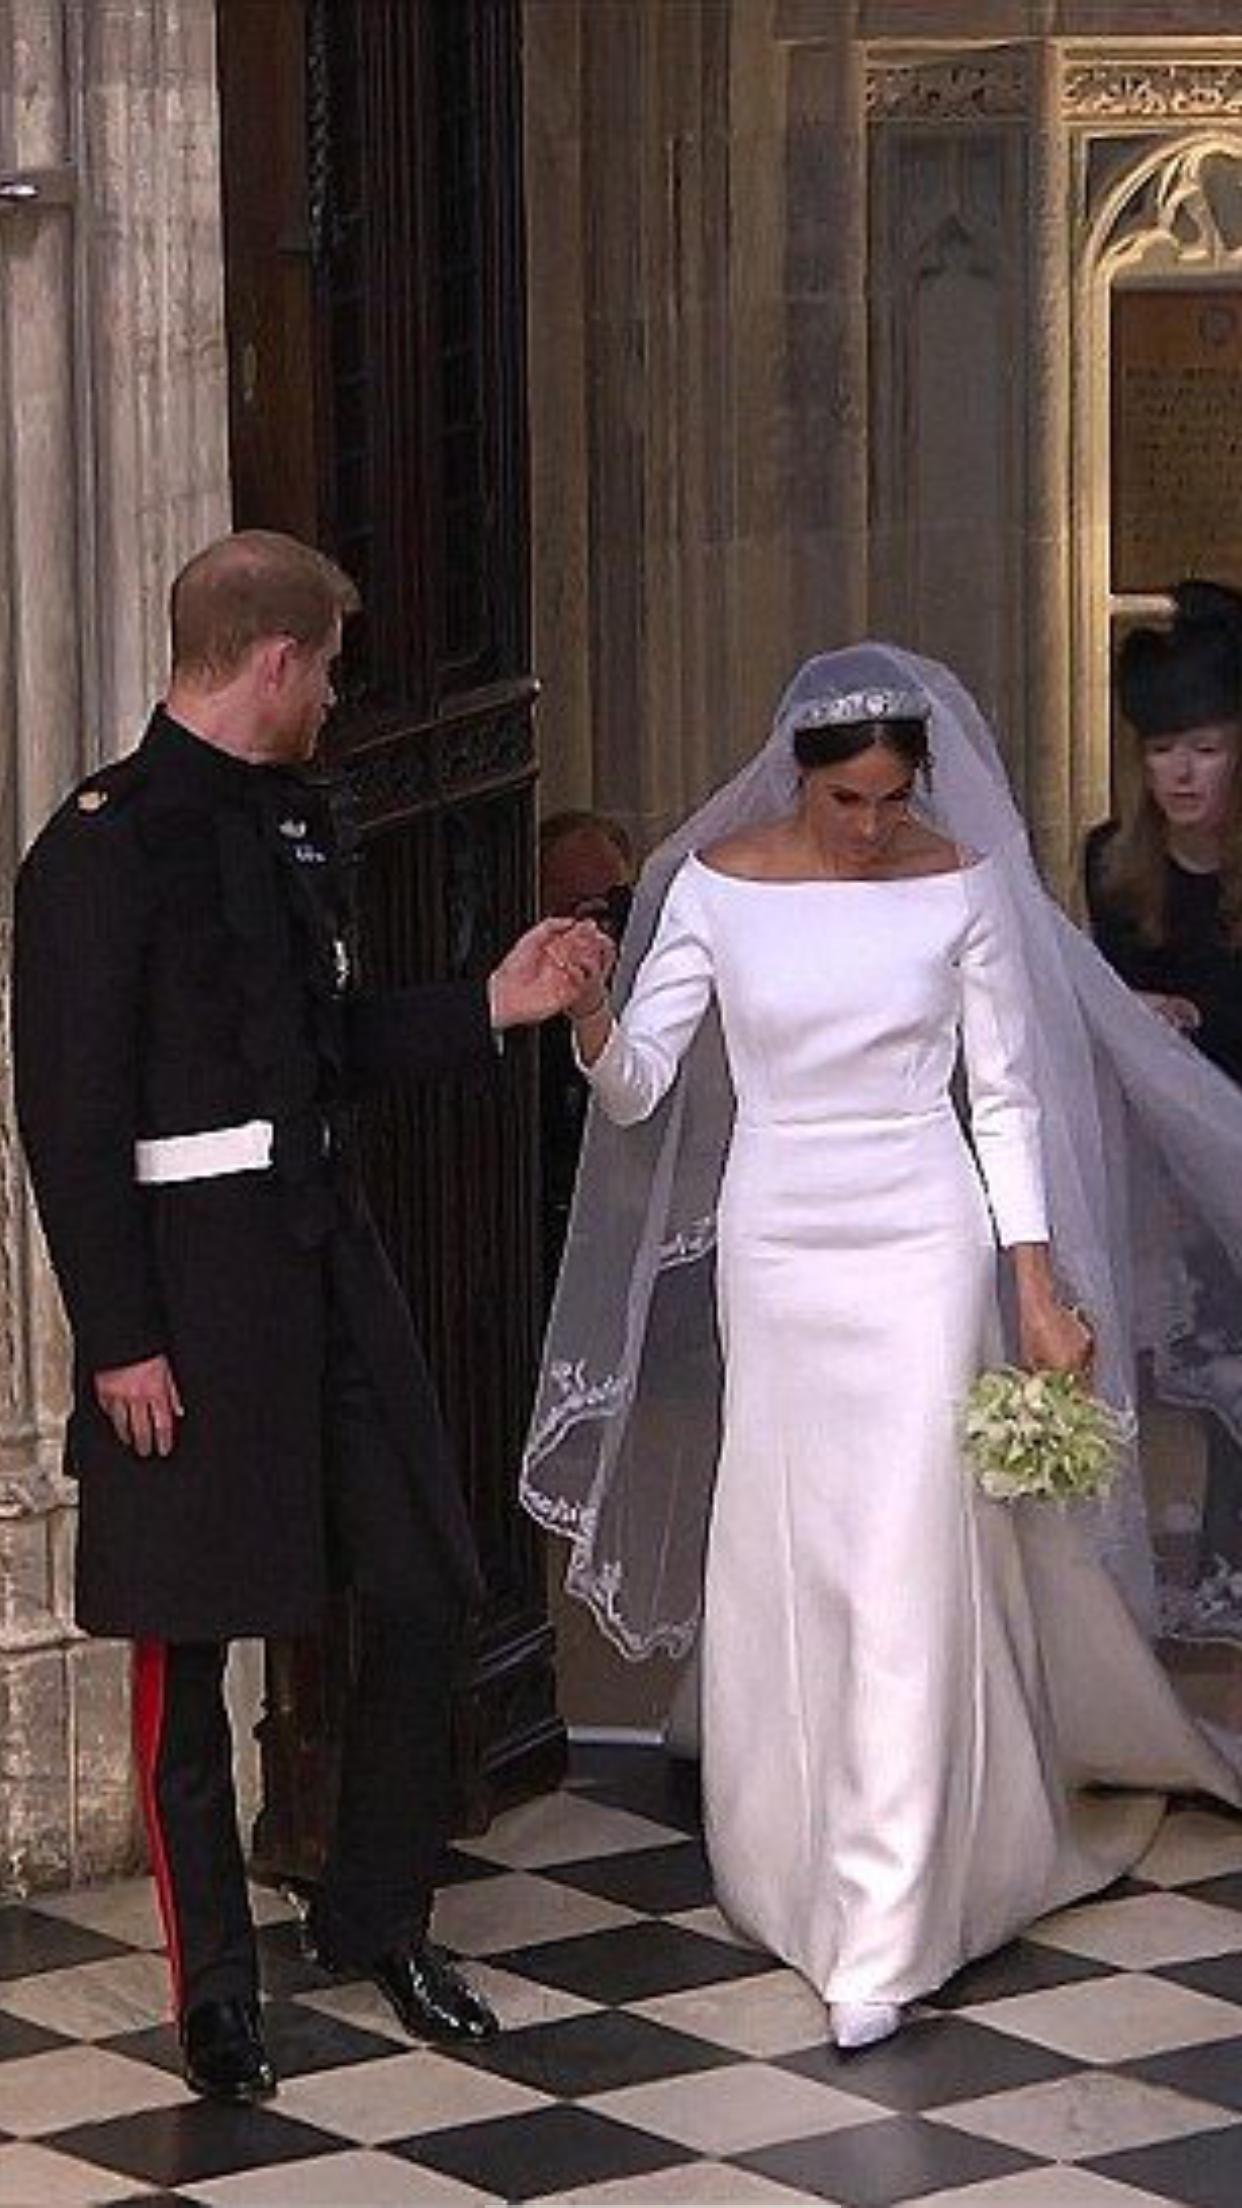 May 19 2018 Prince Harry Meghan Markle S Royal Wedding Givenchy Creative Director Harry And Meghan Wedding Meghan Markle Wedding Dress Princess Meghan